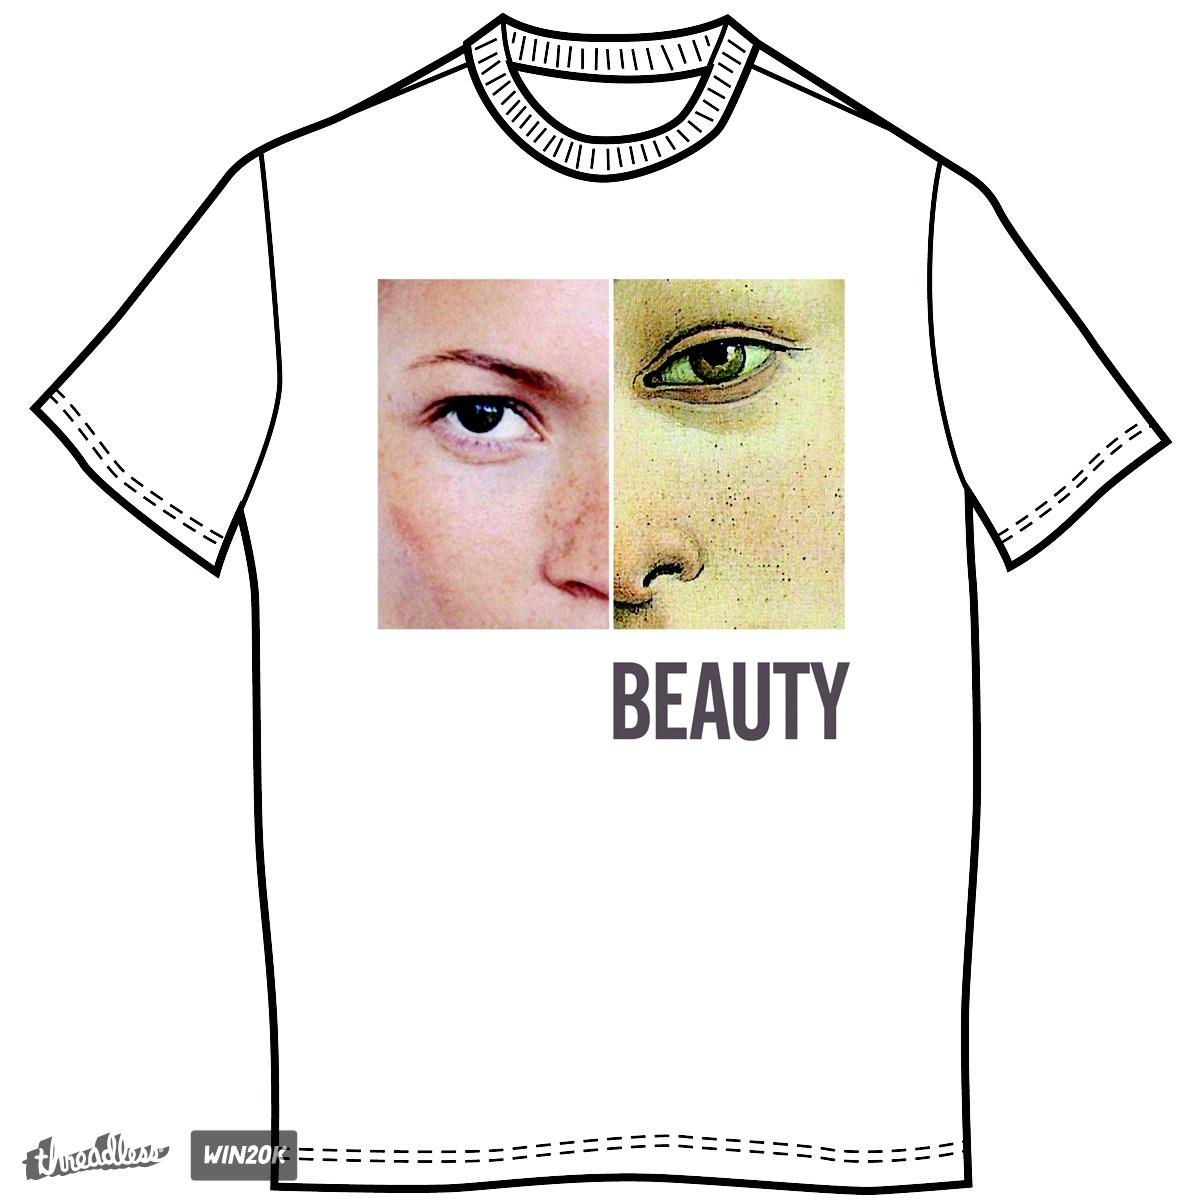 beauty #2 by random_stupid_t on Threadless